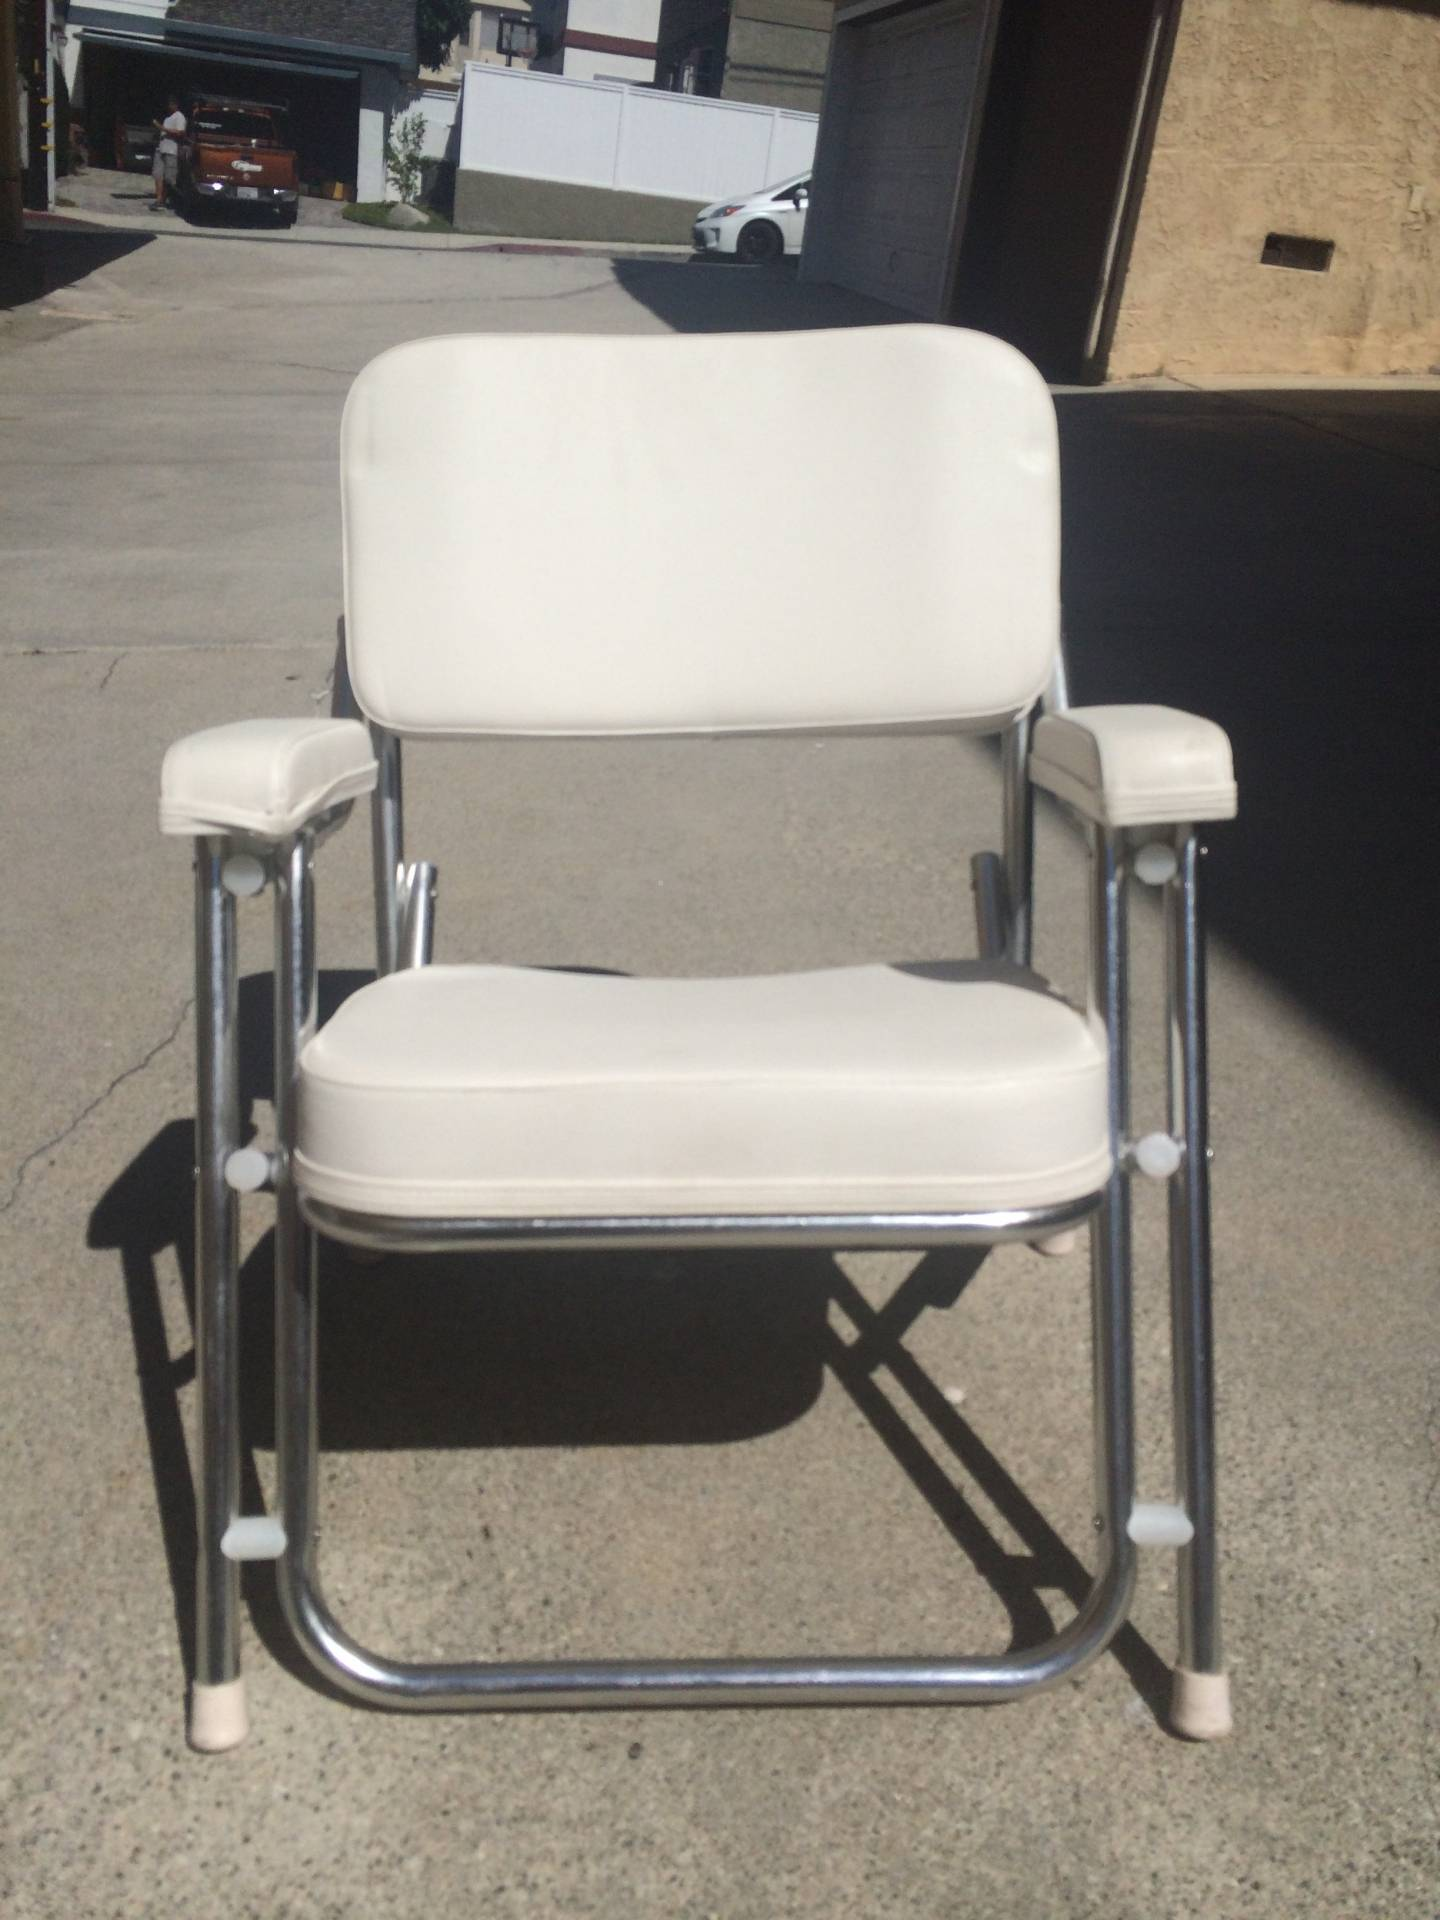 marine deck chairs folding chair dimensions two west aluminum cushion bloodydecks kjg jpg photo 1 2 like new